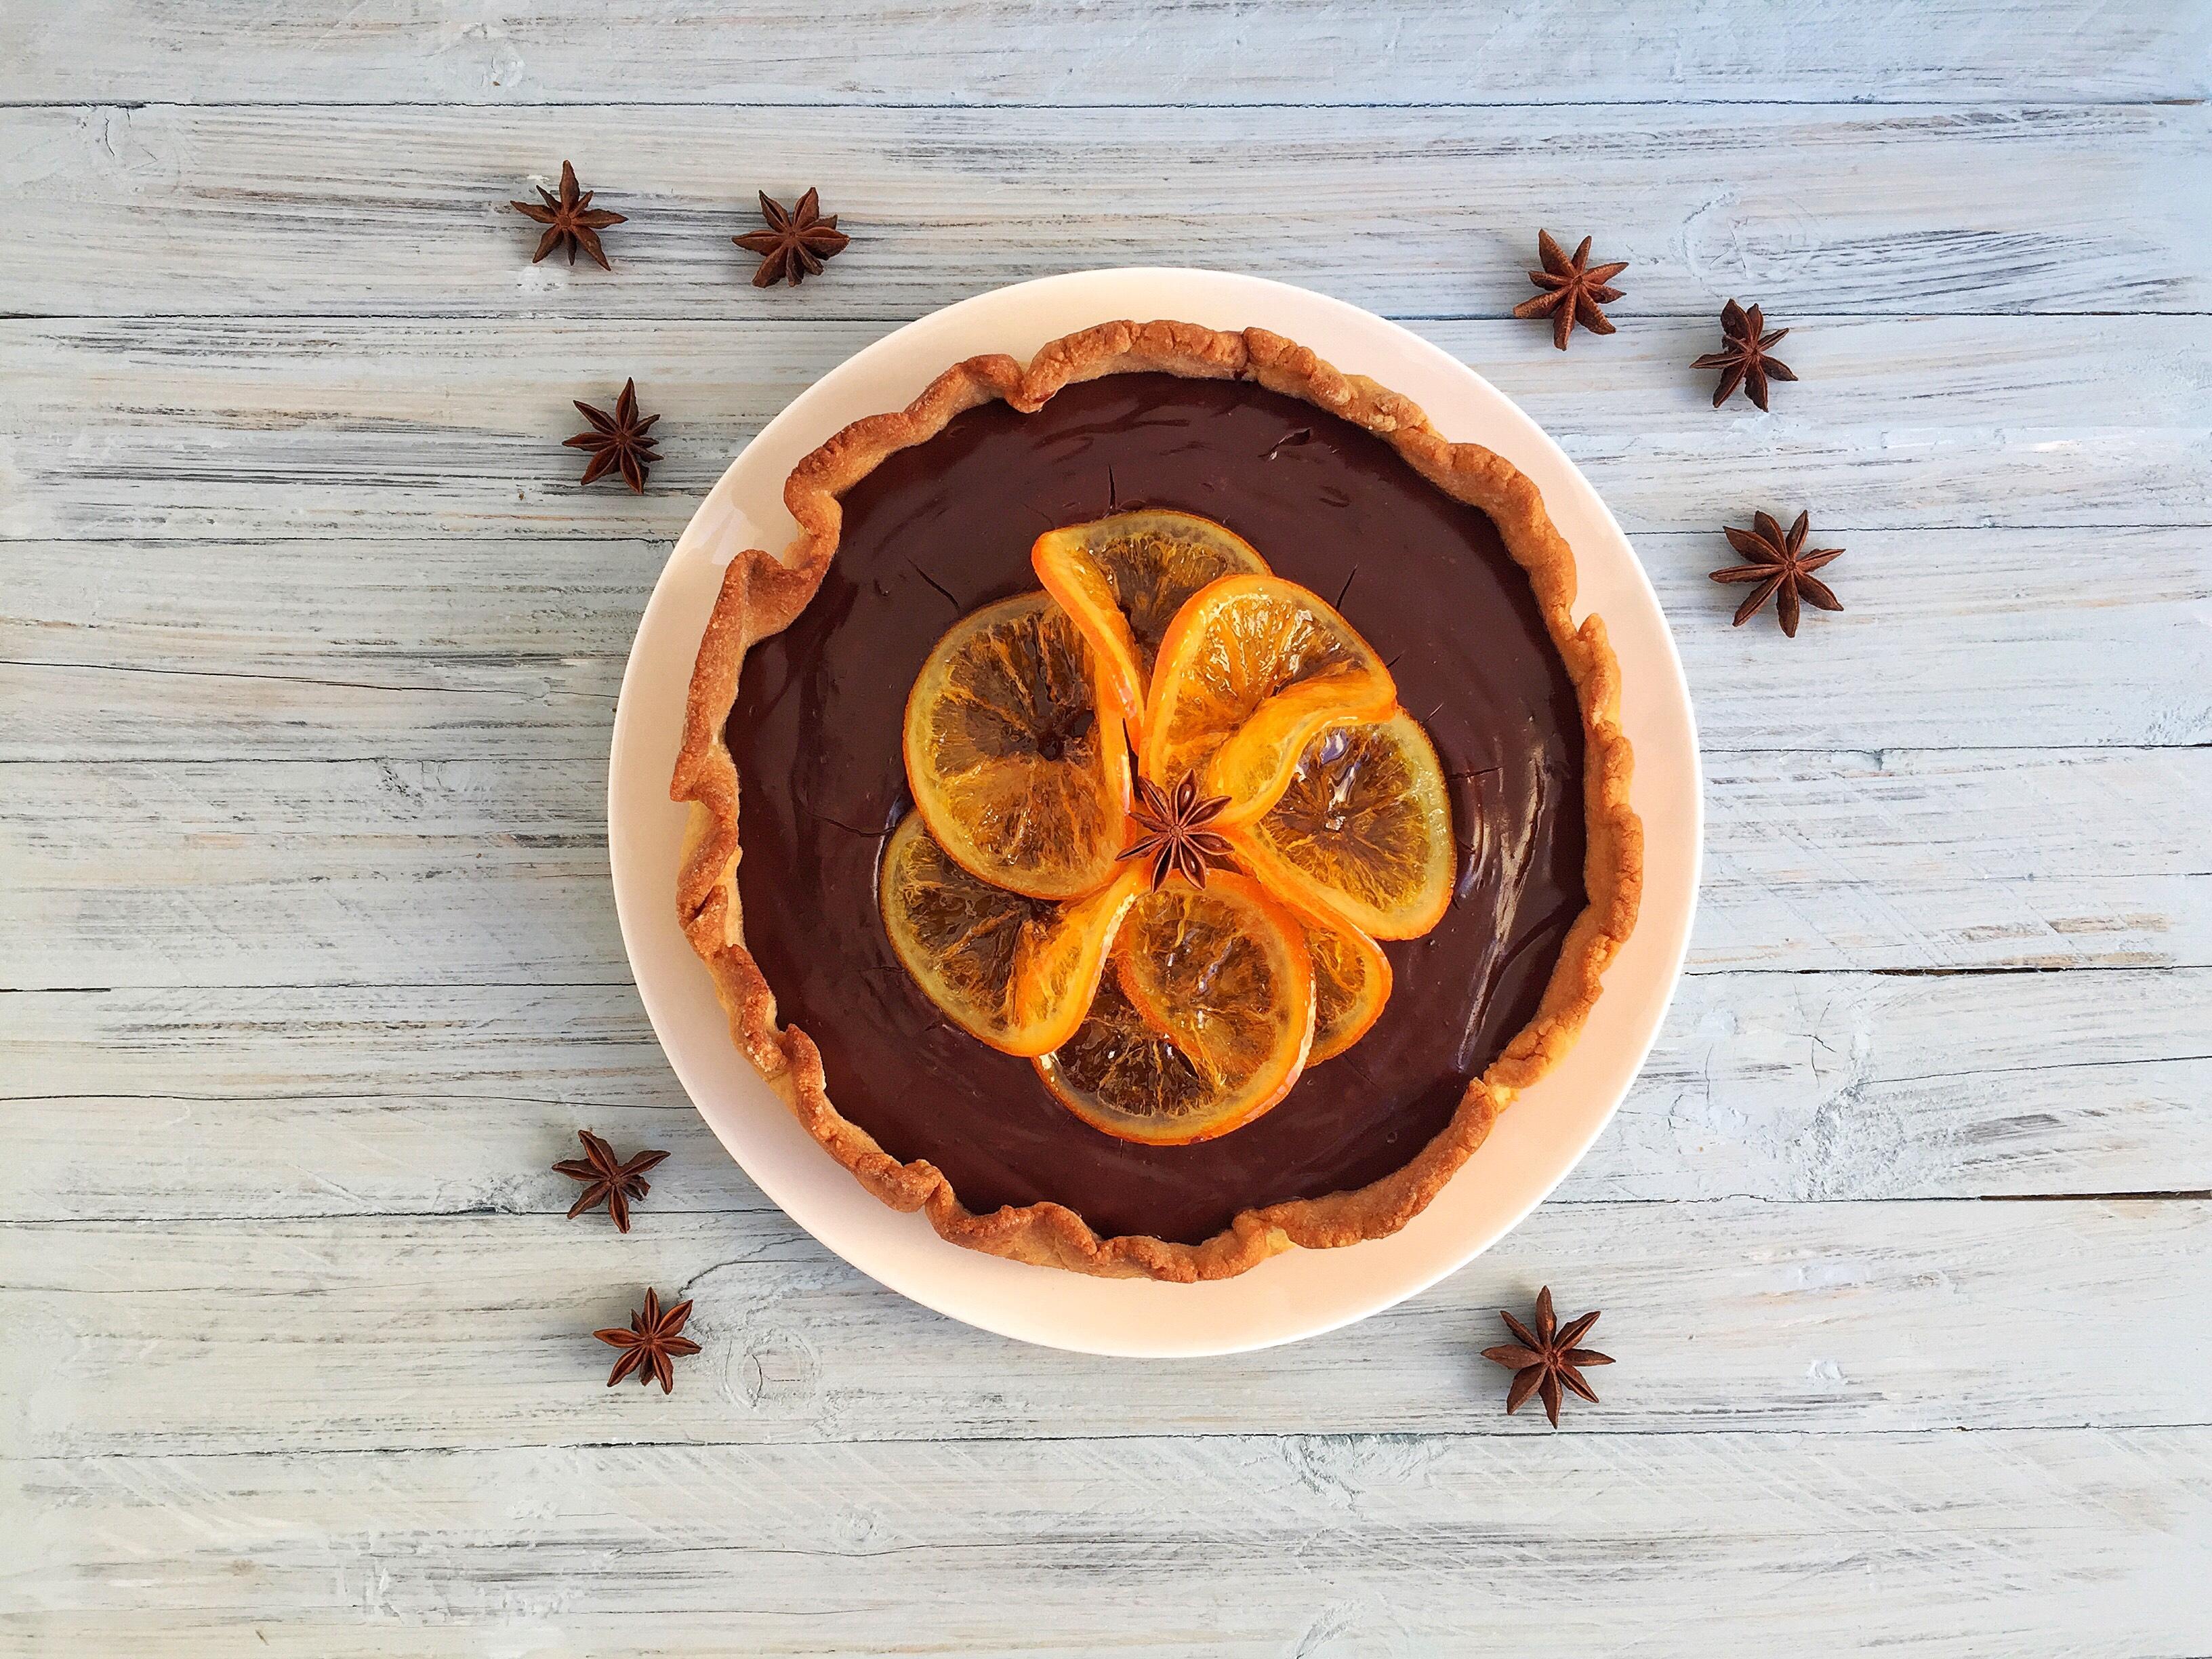 Frolla con crema al cacao e arance caramellate